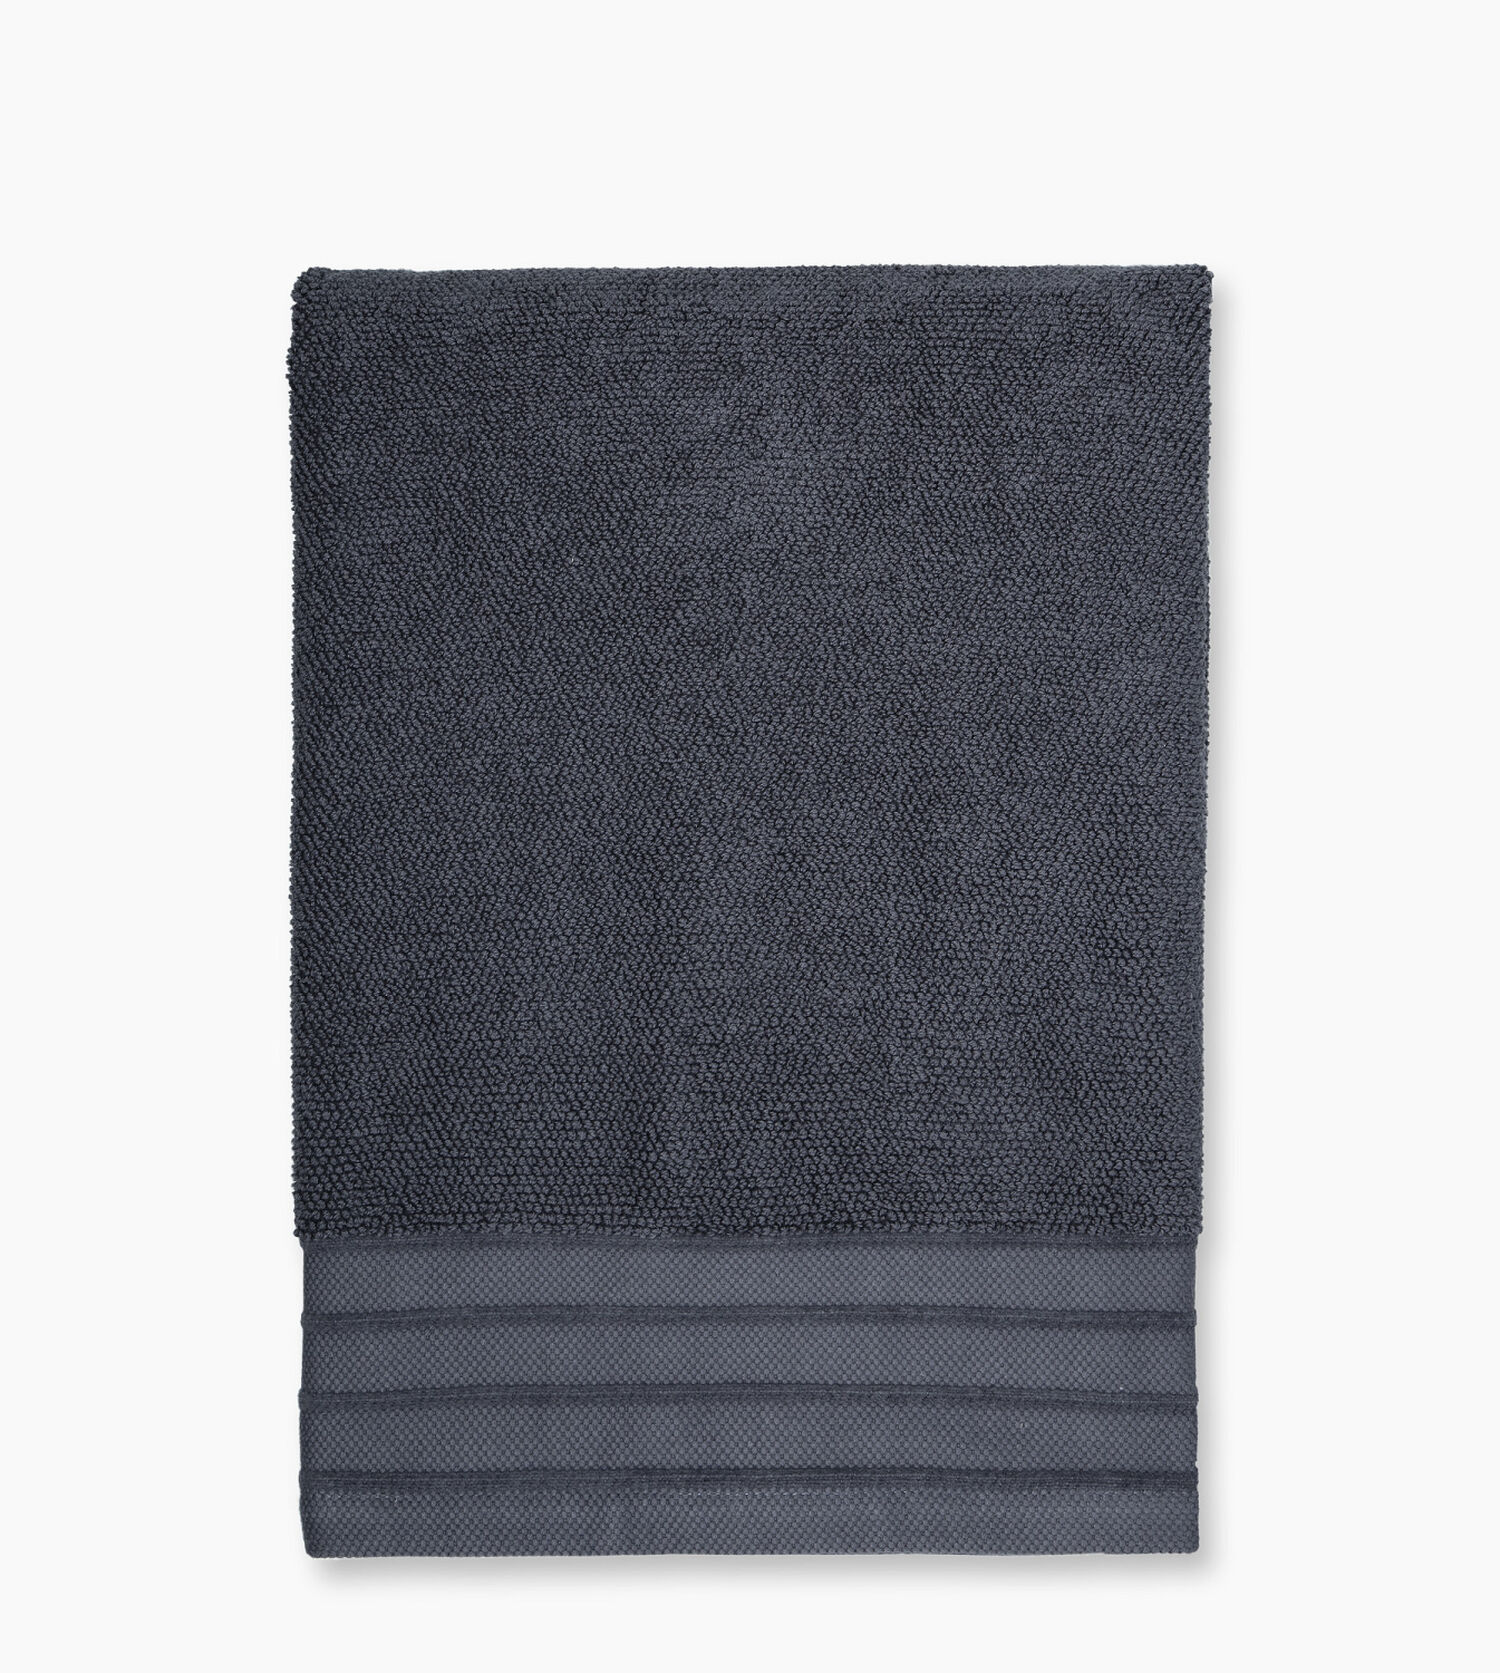 Zoom Clic Luxe Bath Towel Image 1 Of 2